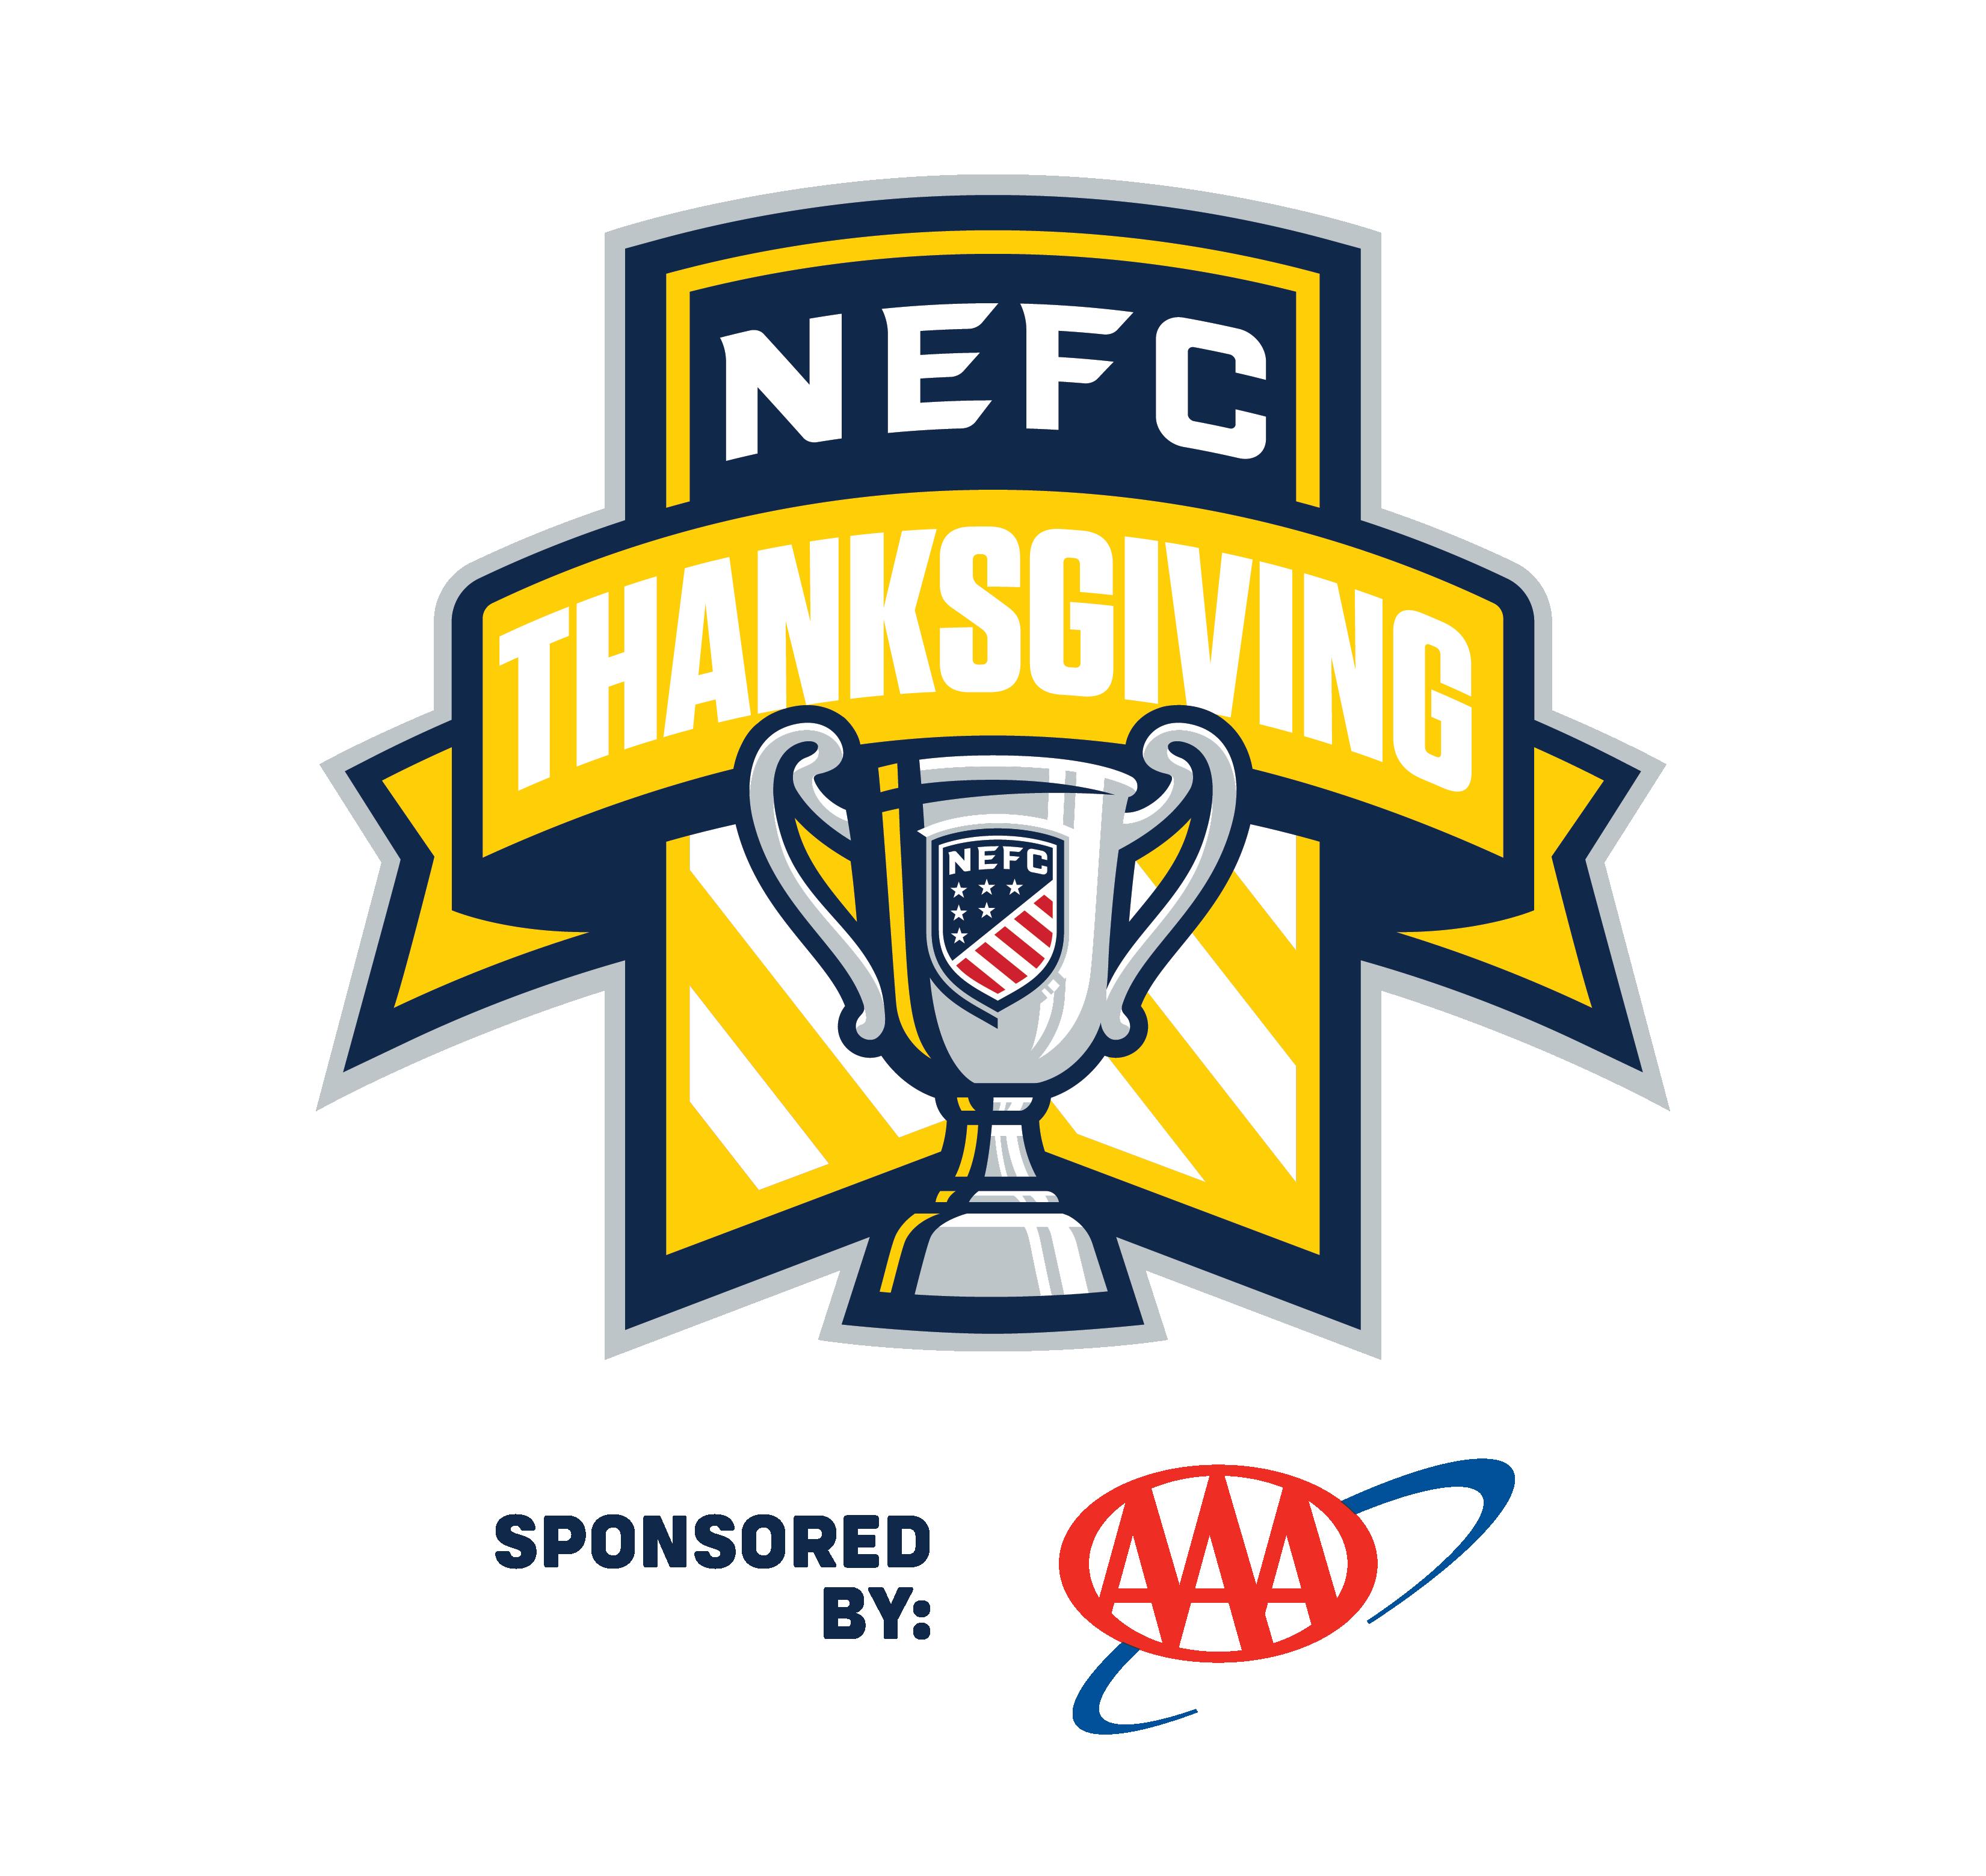 NEFC_Tournaments-Thanksgiving_AAA_Sponsor-Final